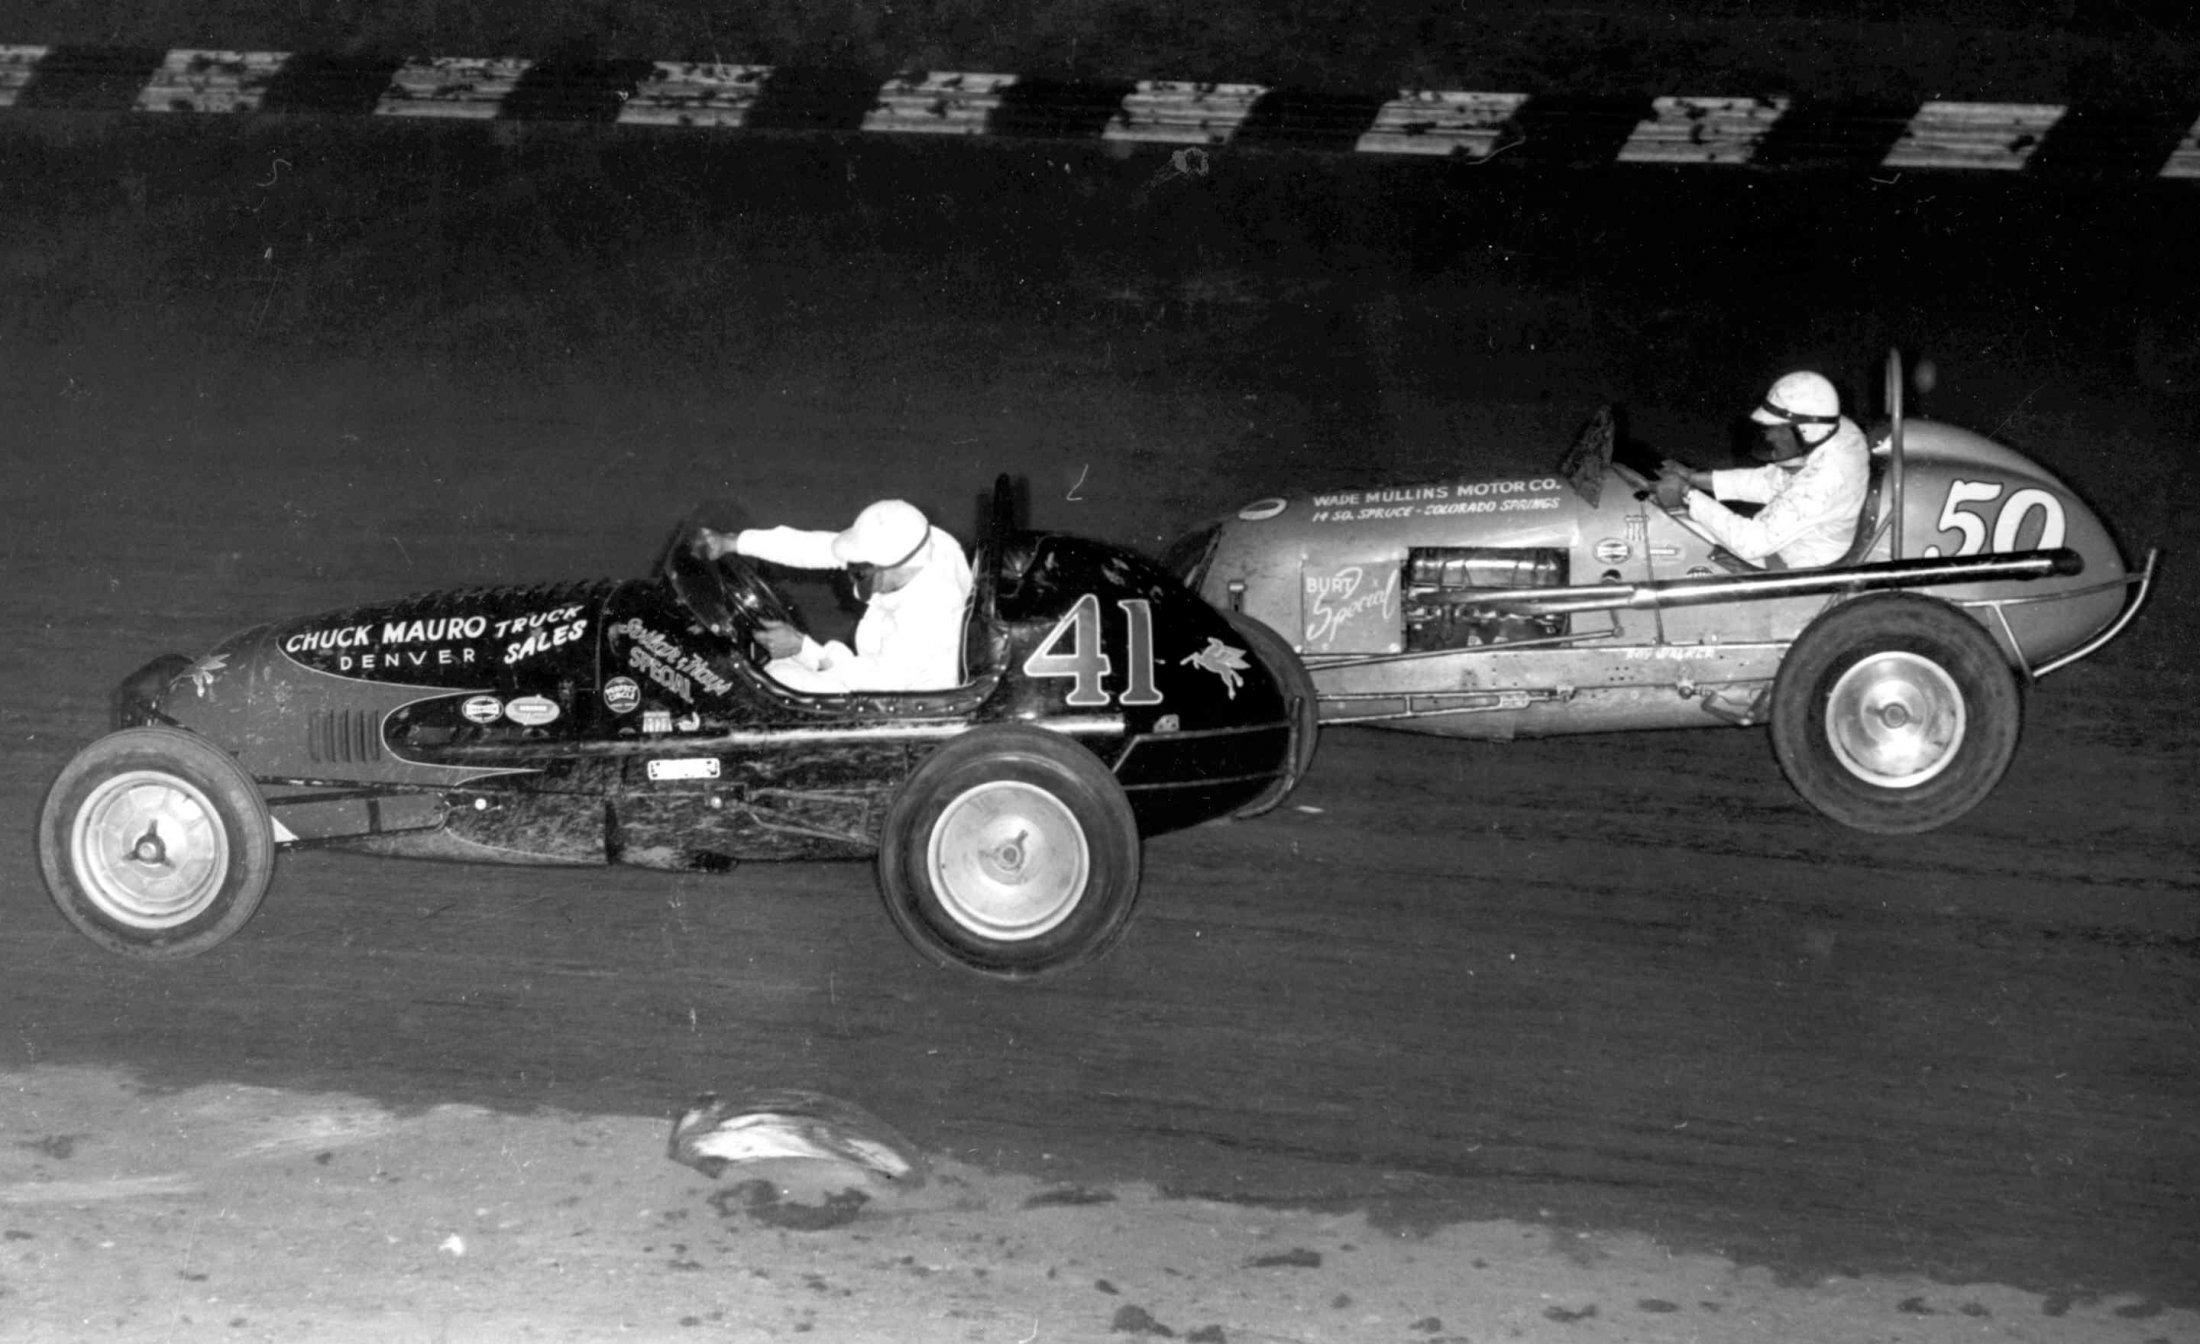 1959 Englewood, CO. Hahn & Walker